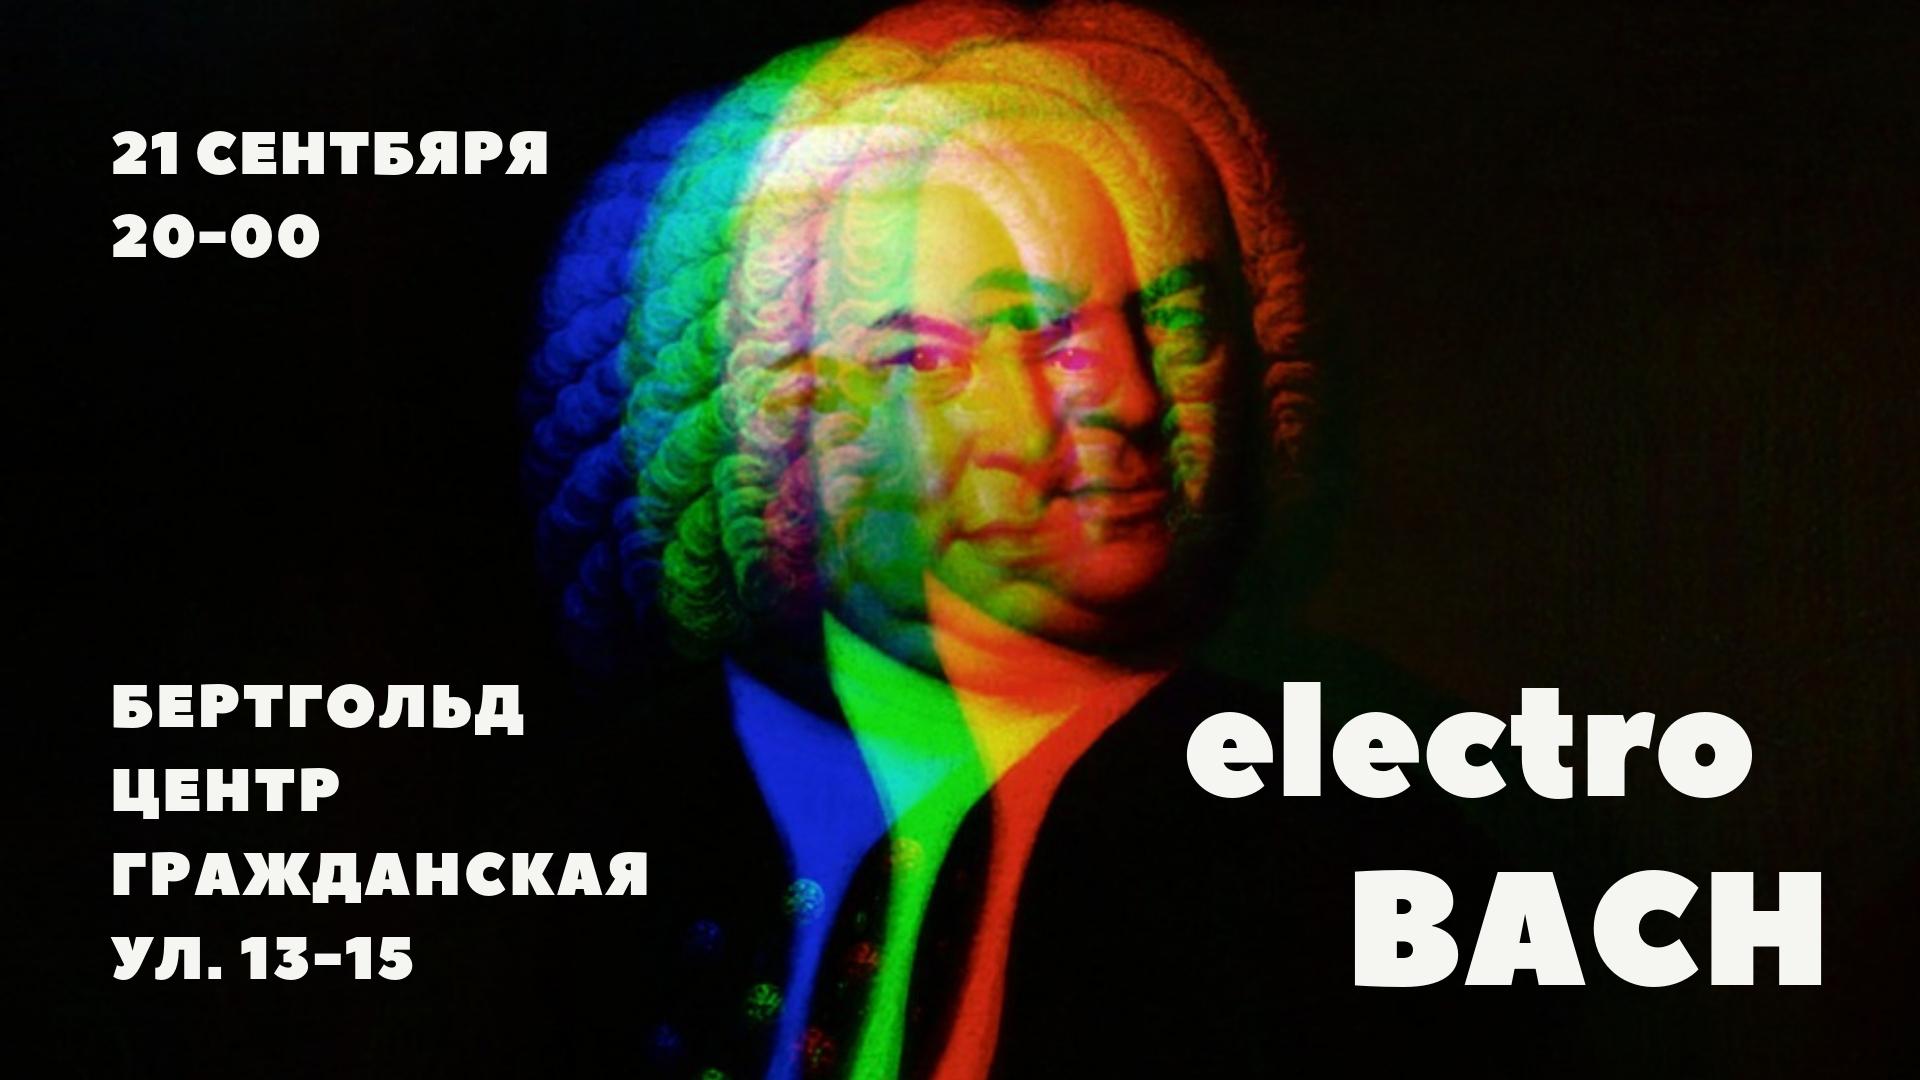 Альцеста. Фестиваль digital barocco. Alceste fest, electro bach